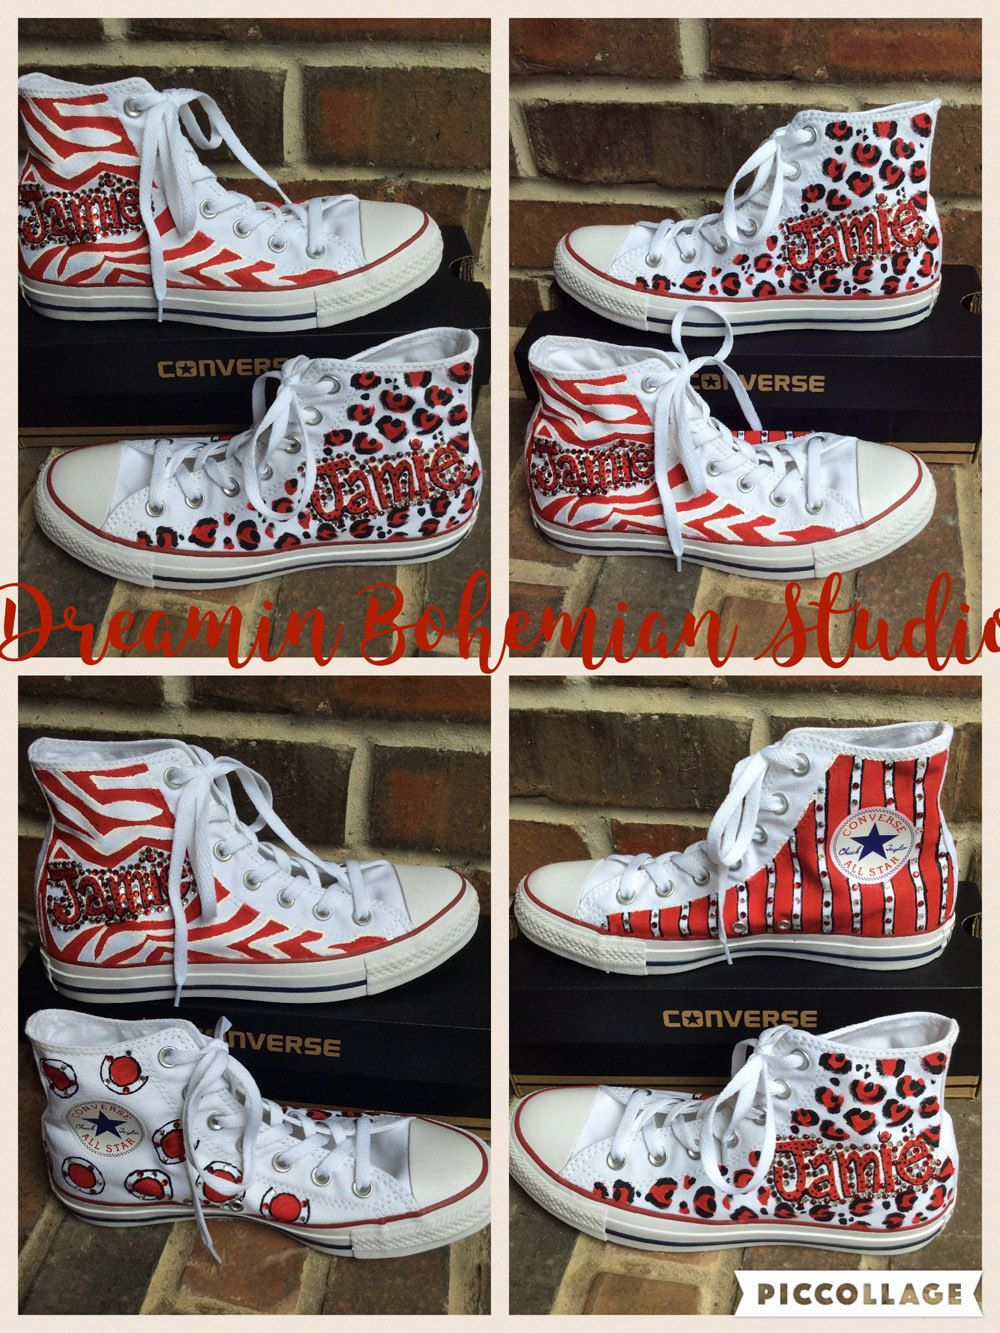 181d61c6efa2 Handpainted Zebra Print in School Colors Personalized Converse ...